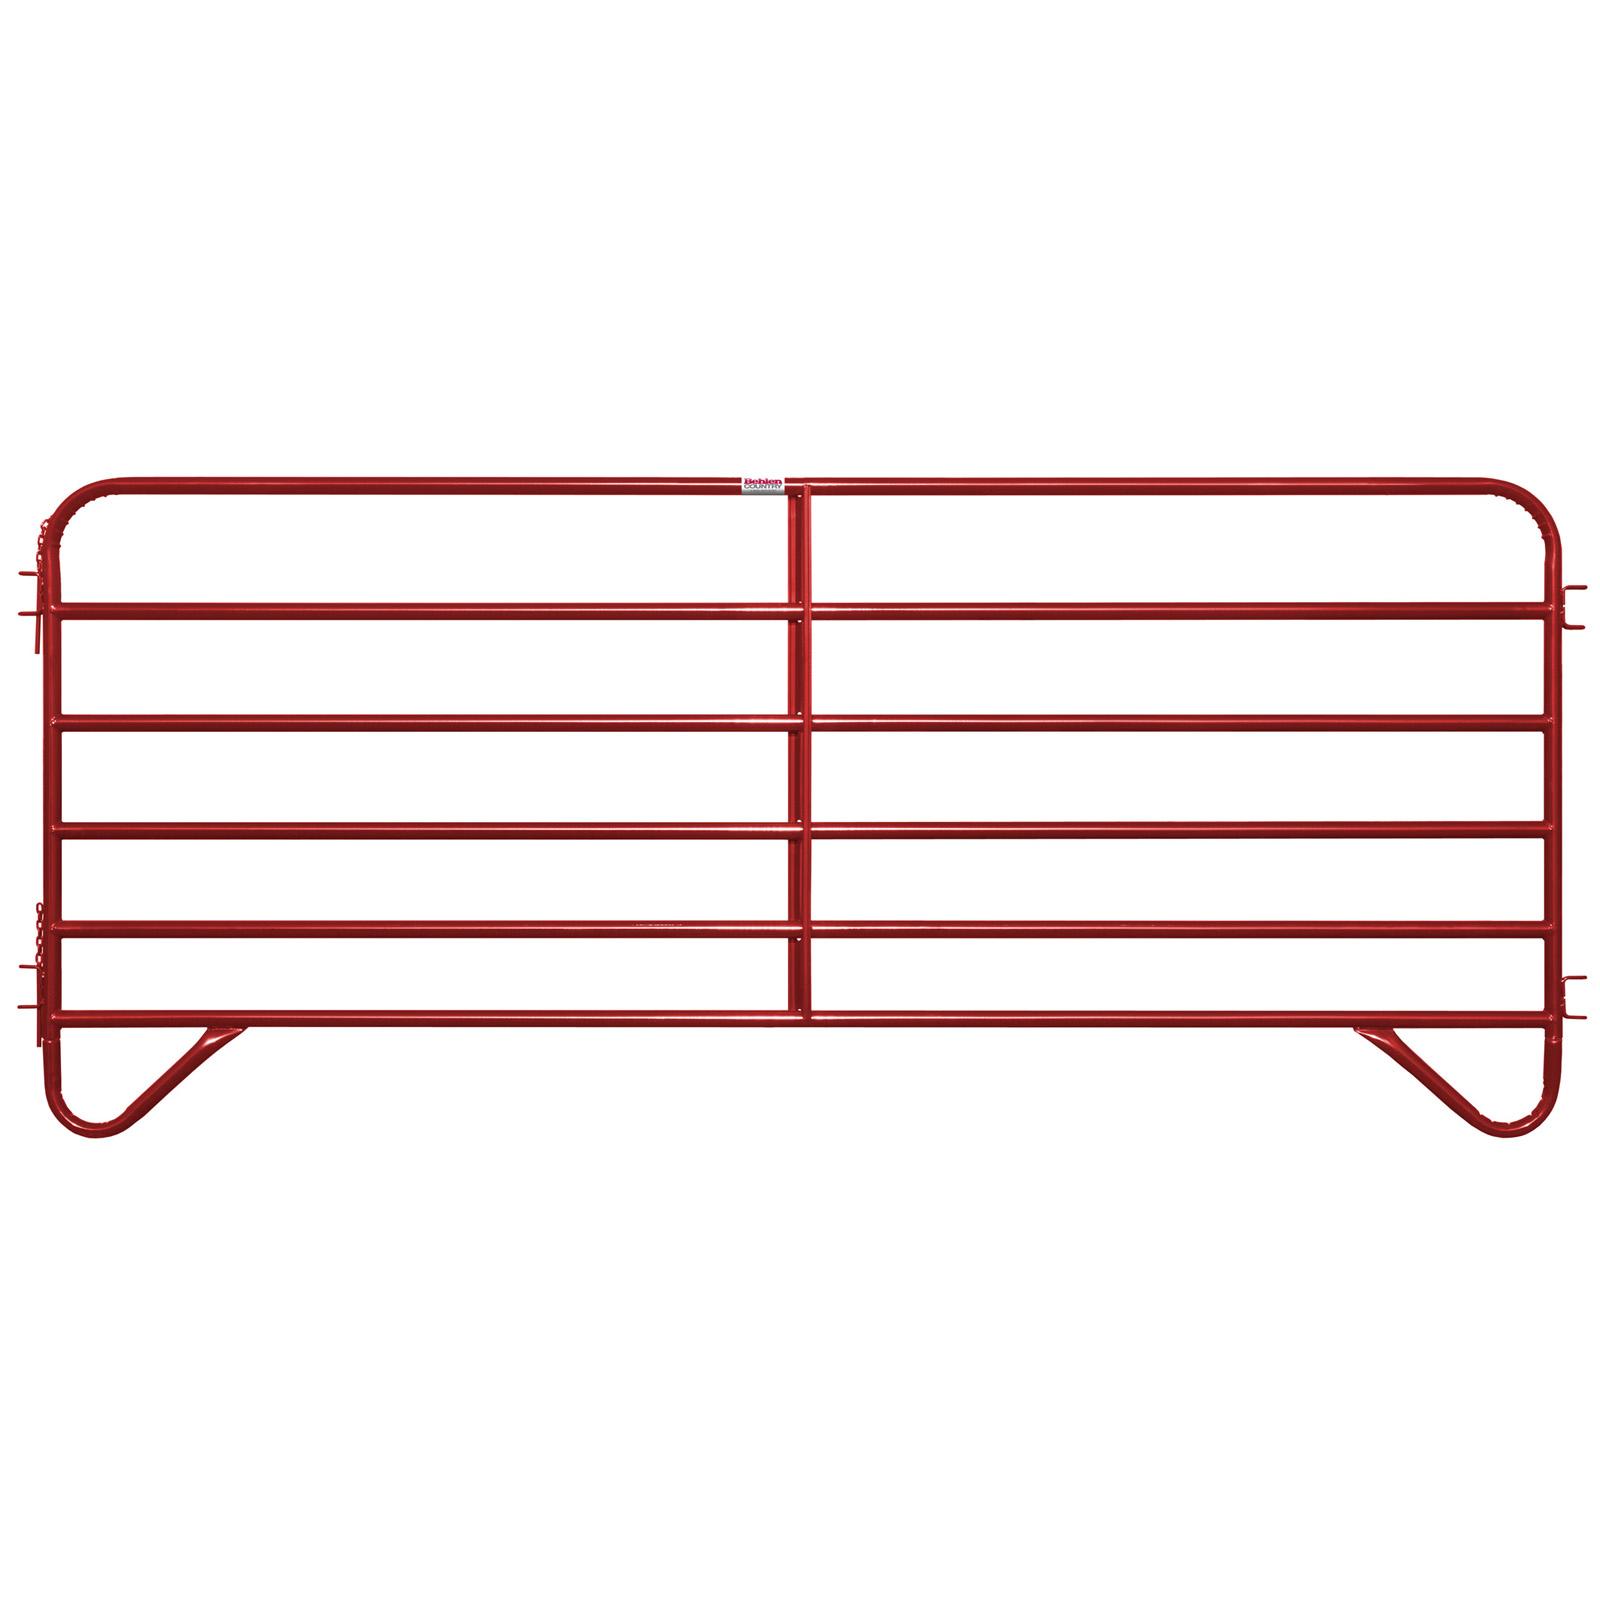 Panel-Utility-Painted Thumbnail